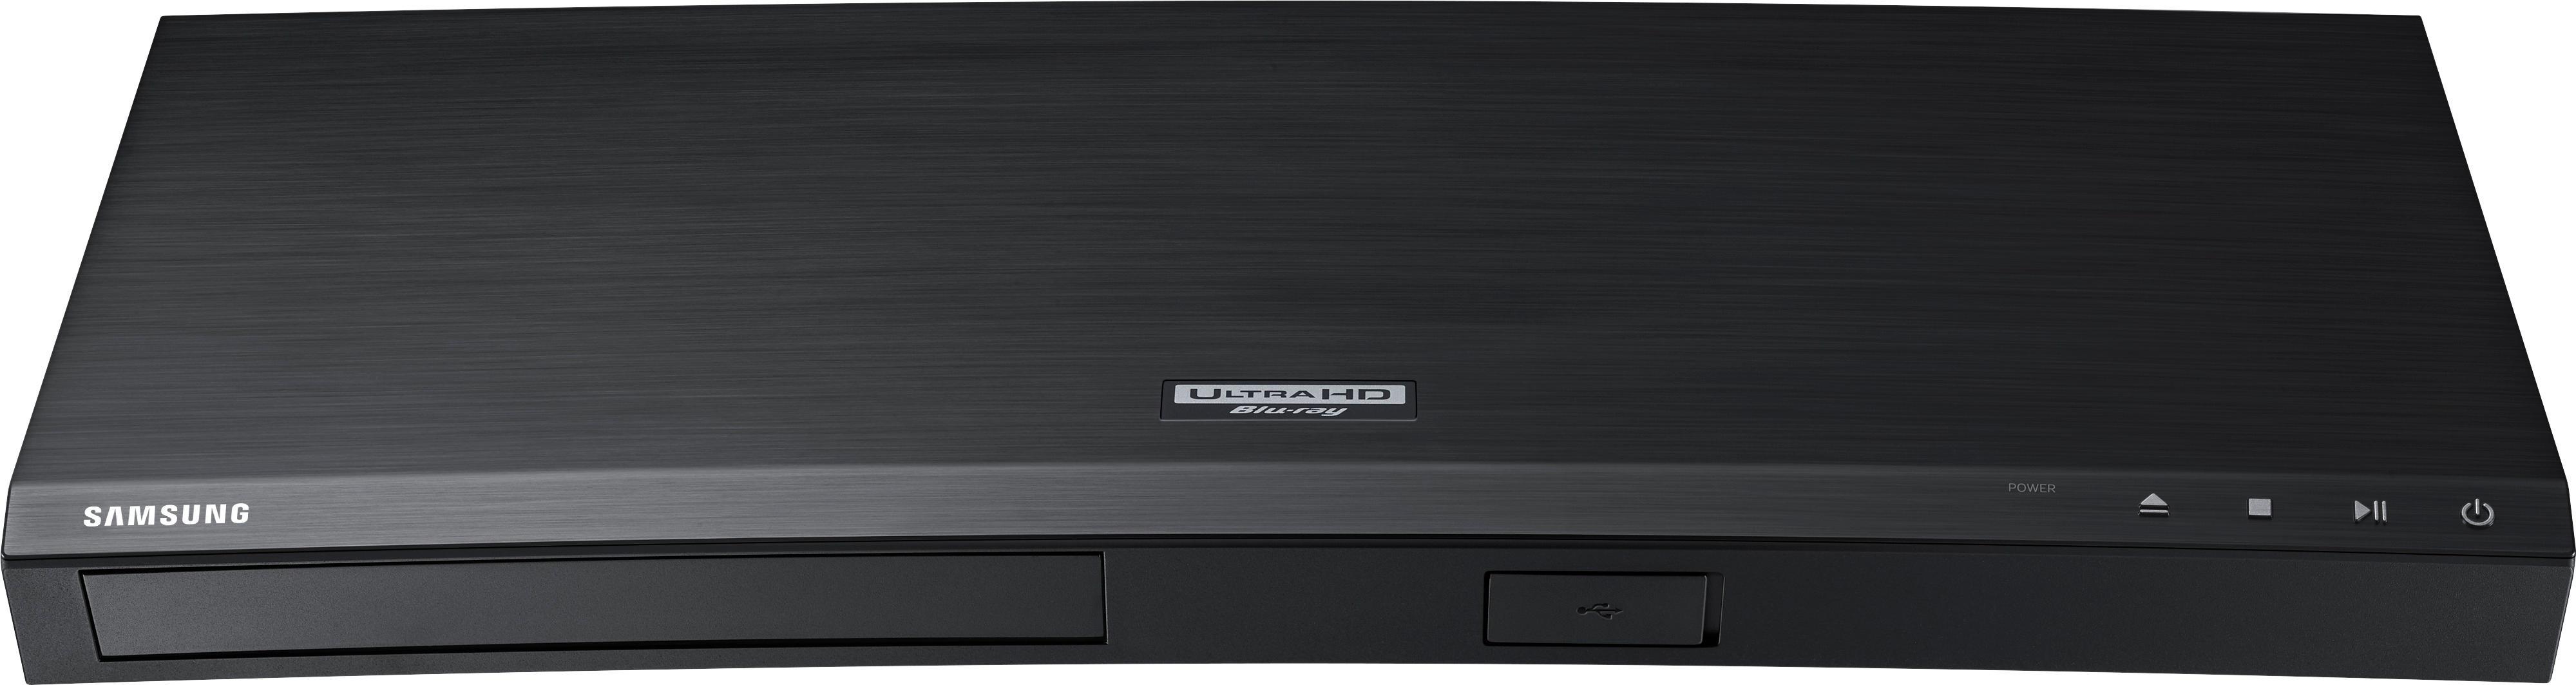 Samsung UBD-M8500 4K  Wi-Fi Blu-ray Player $150 + free s/h